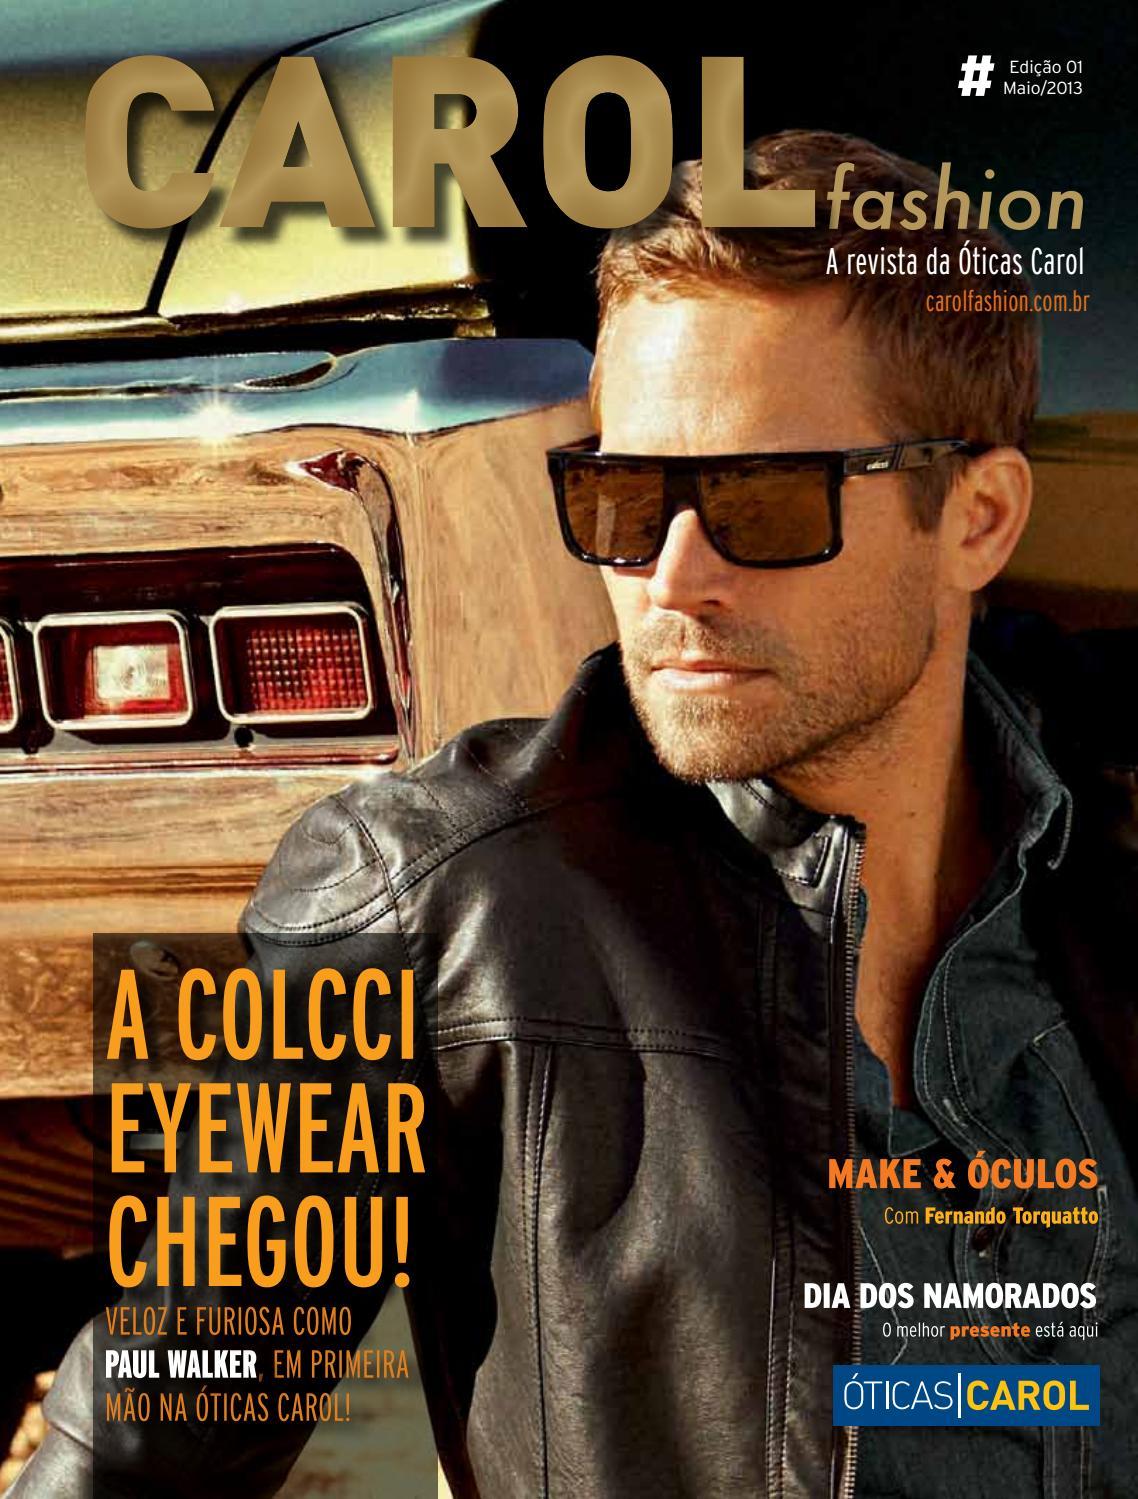 79299028734cf Revista Carol Fashion   Edição 01 by Diego Baptista - issuu